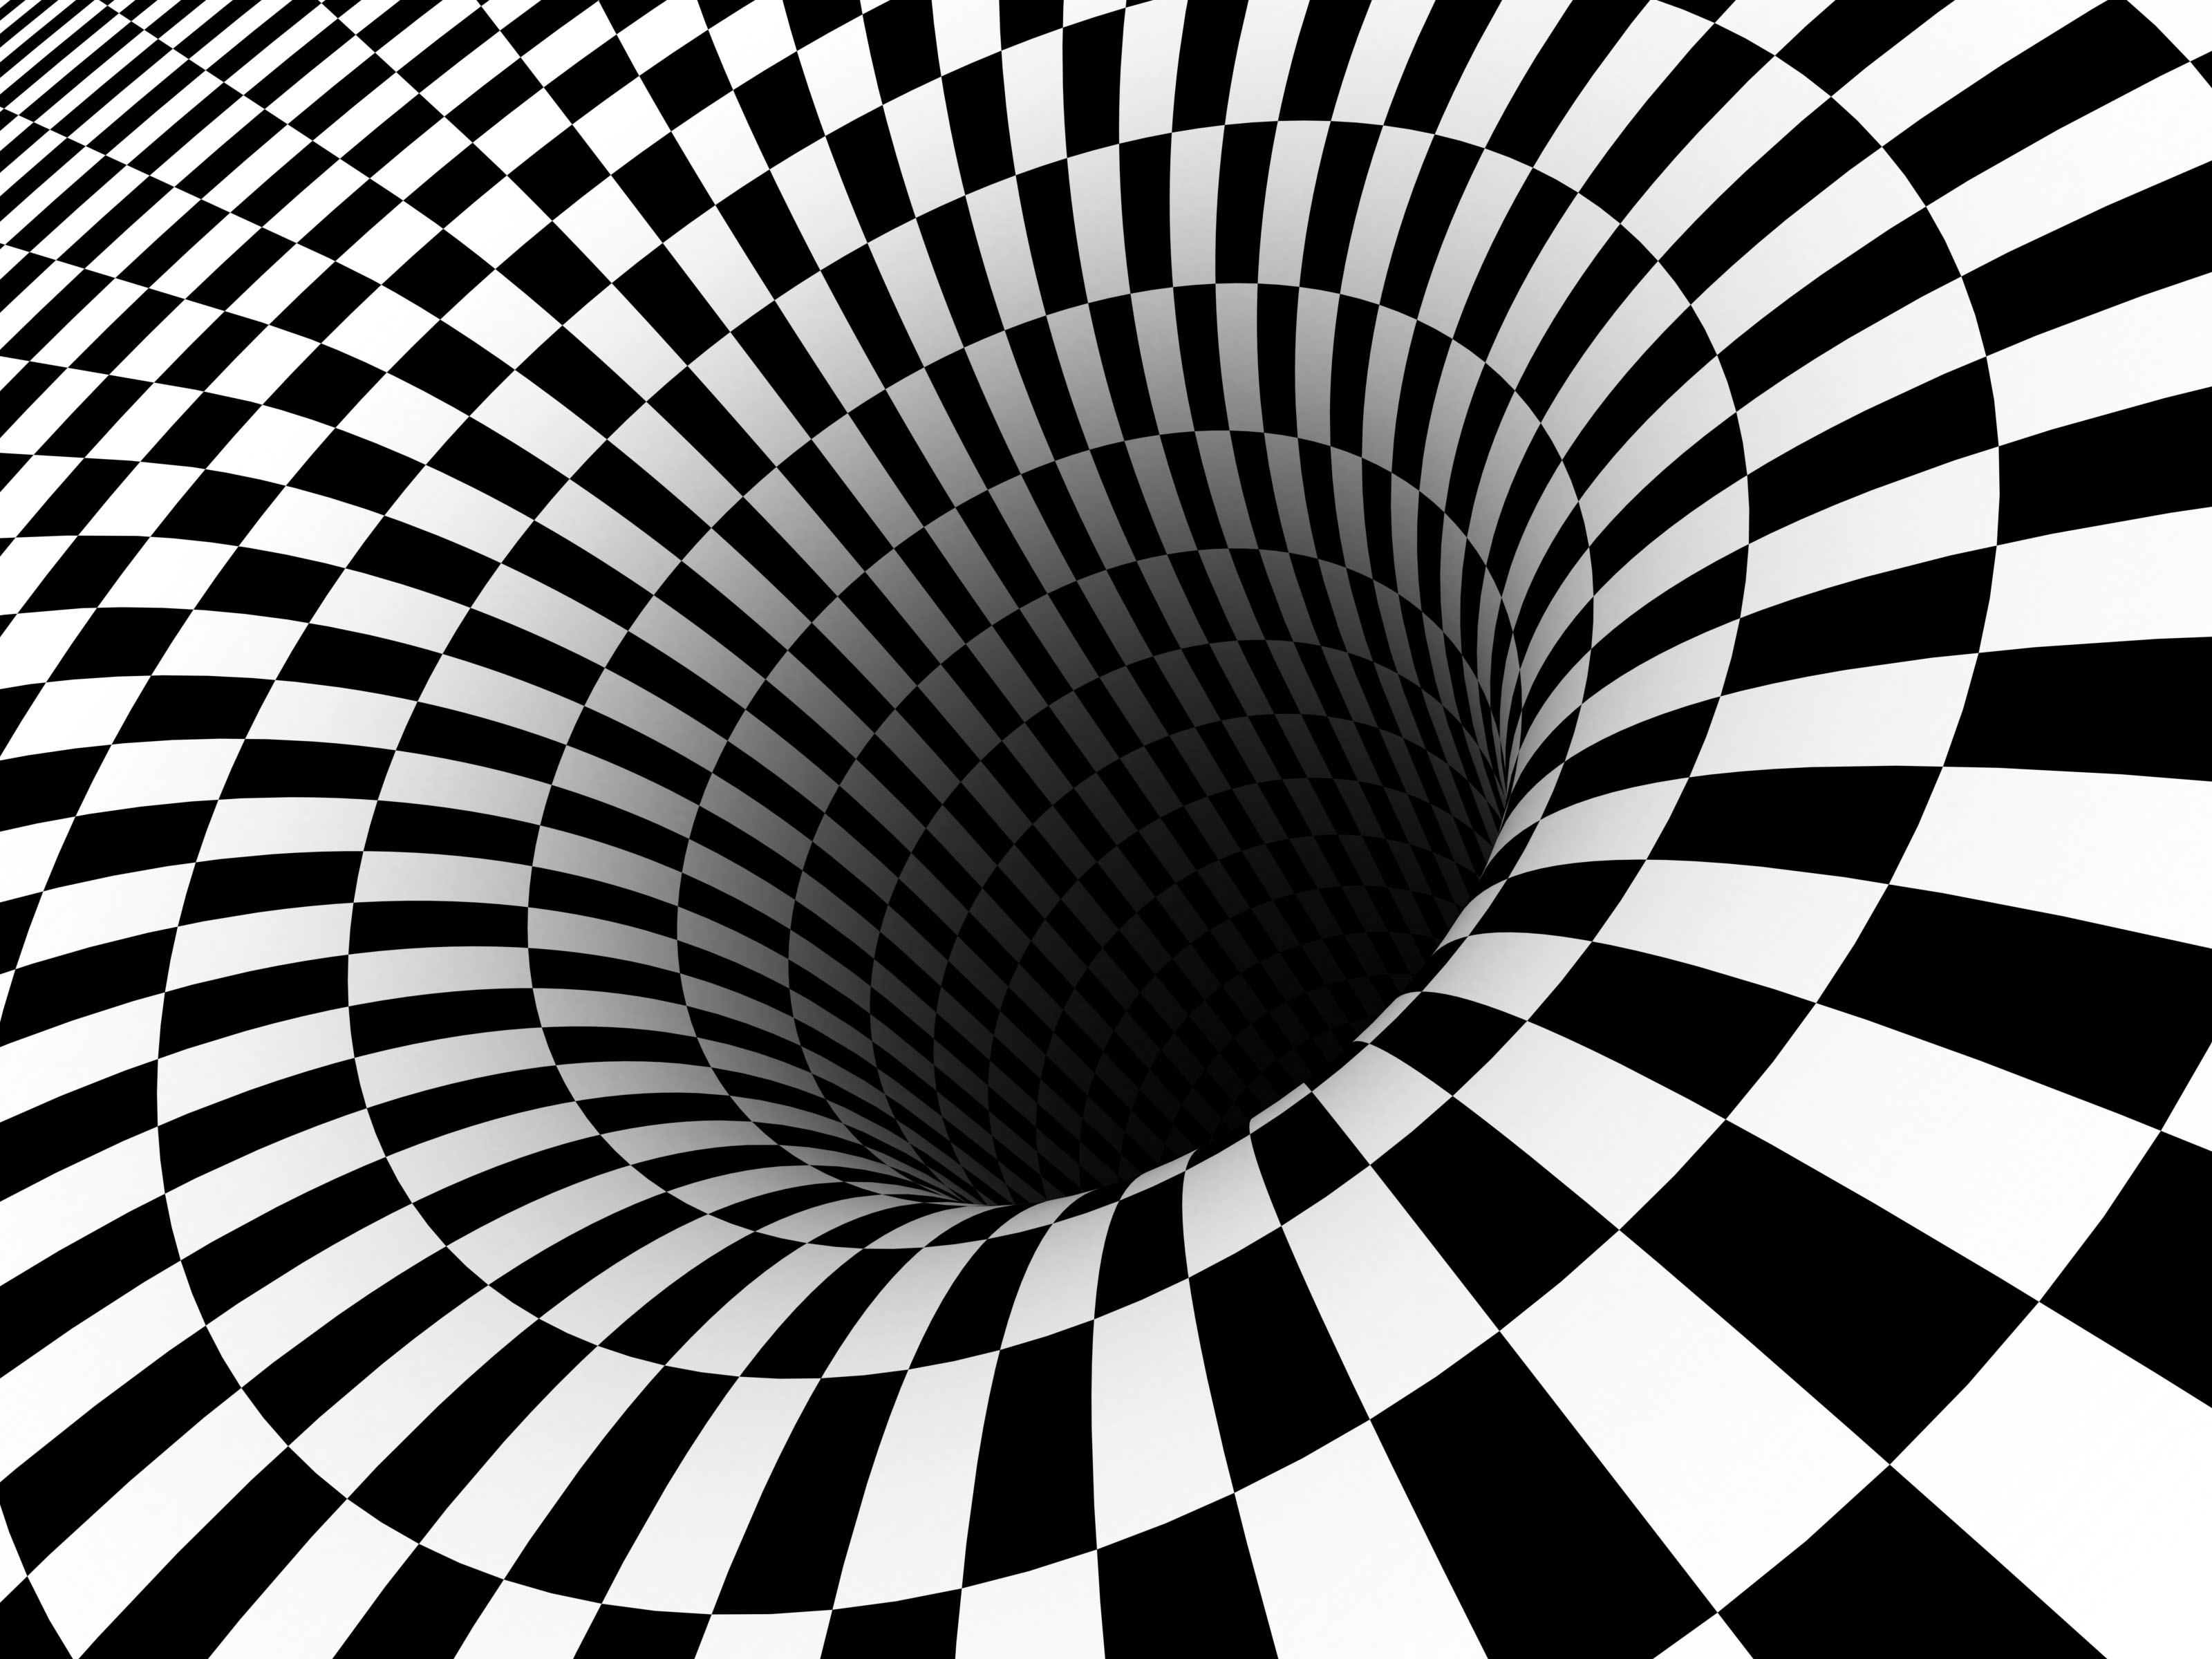 Drawn bus optical illusion #2